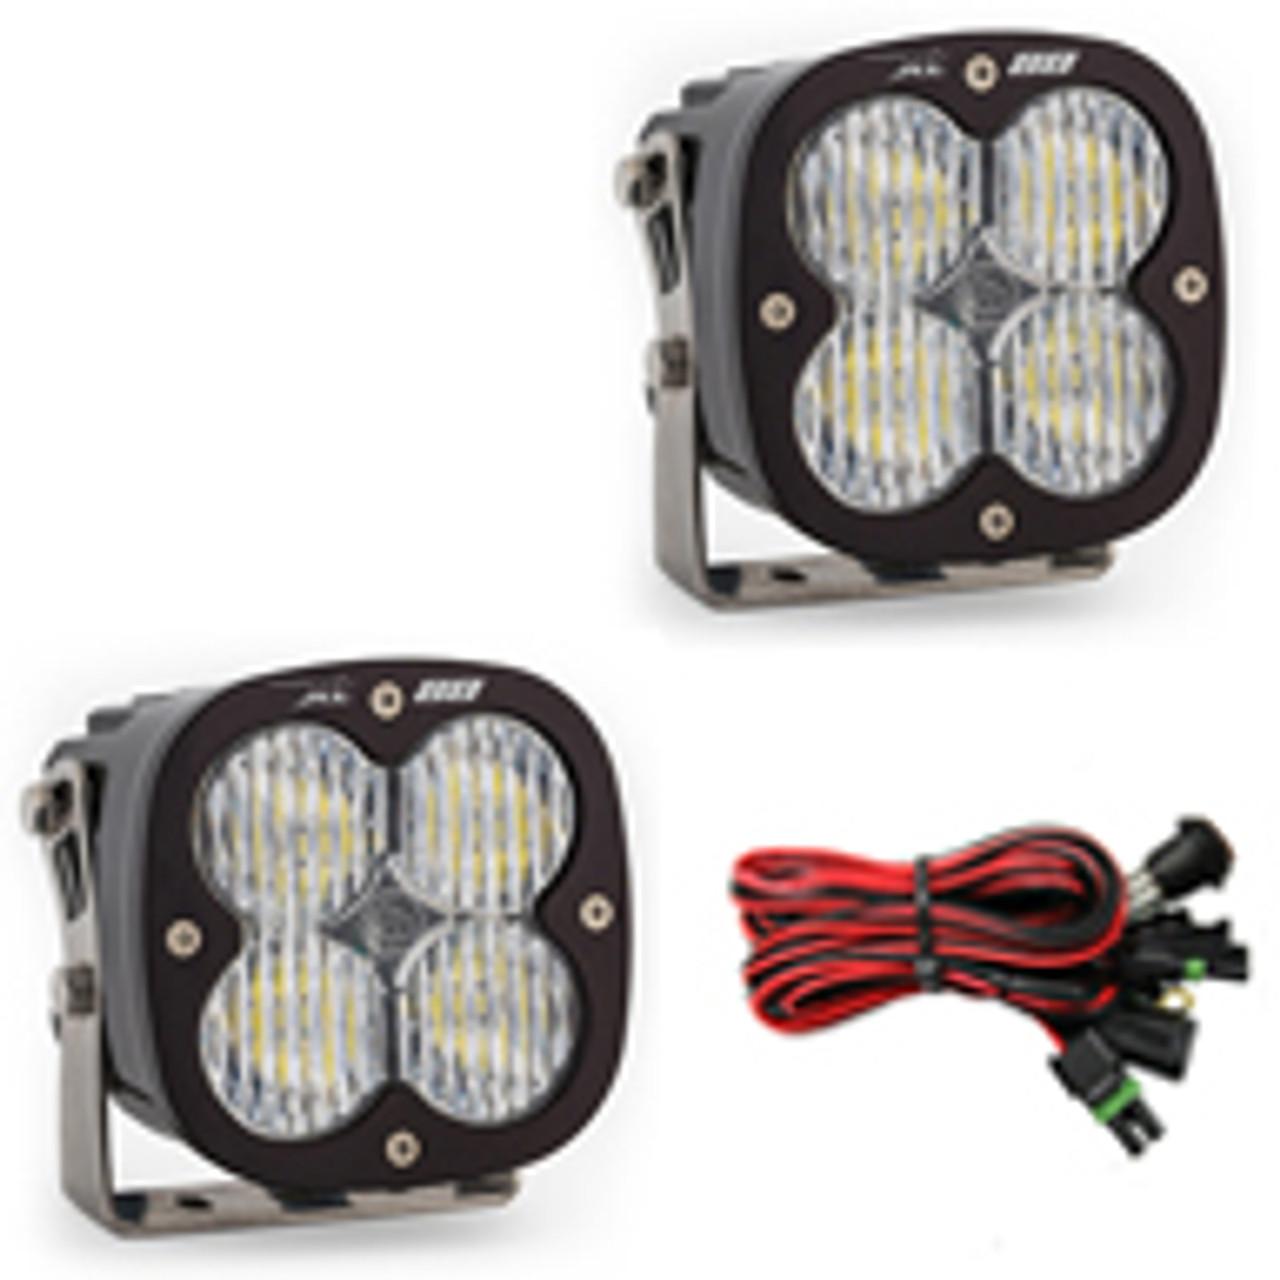 XL80 LED Light, Pair